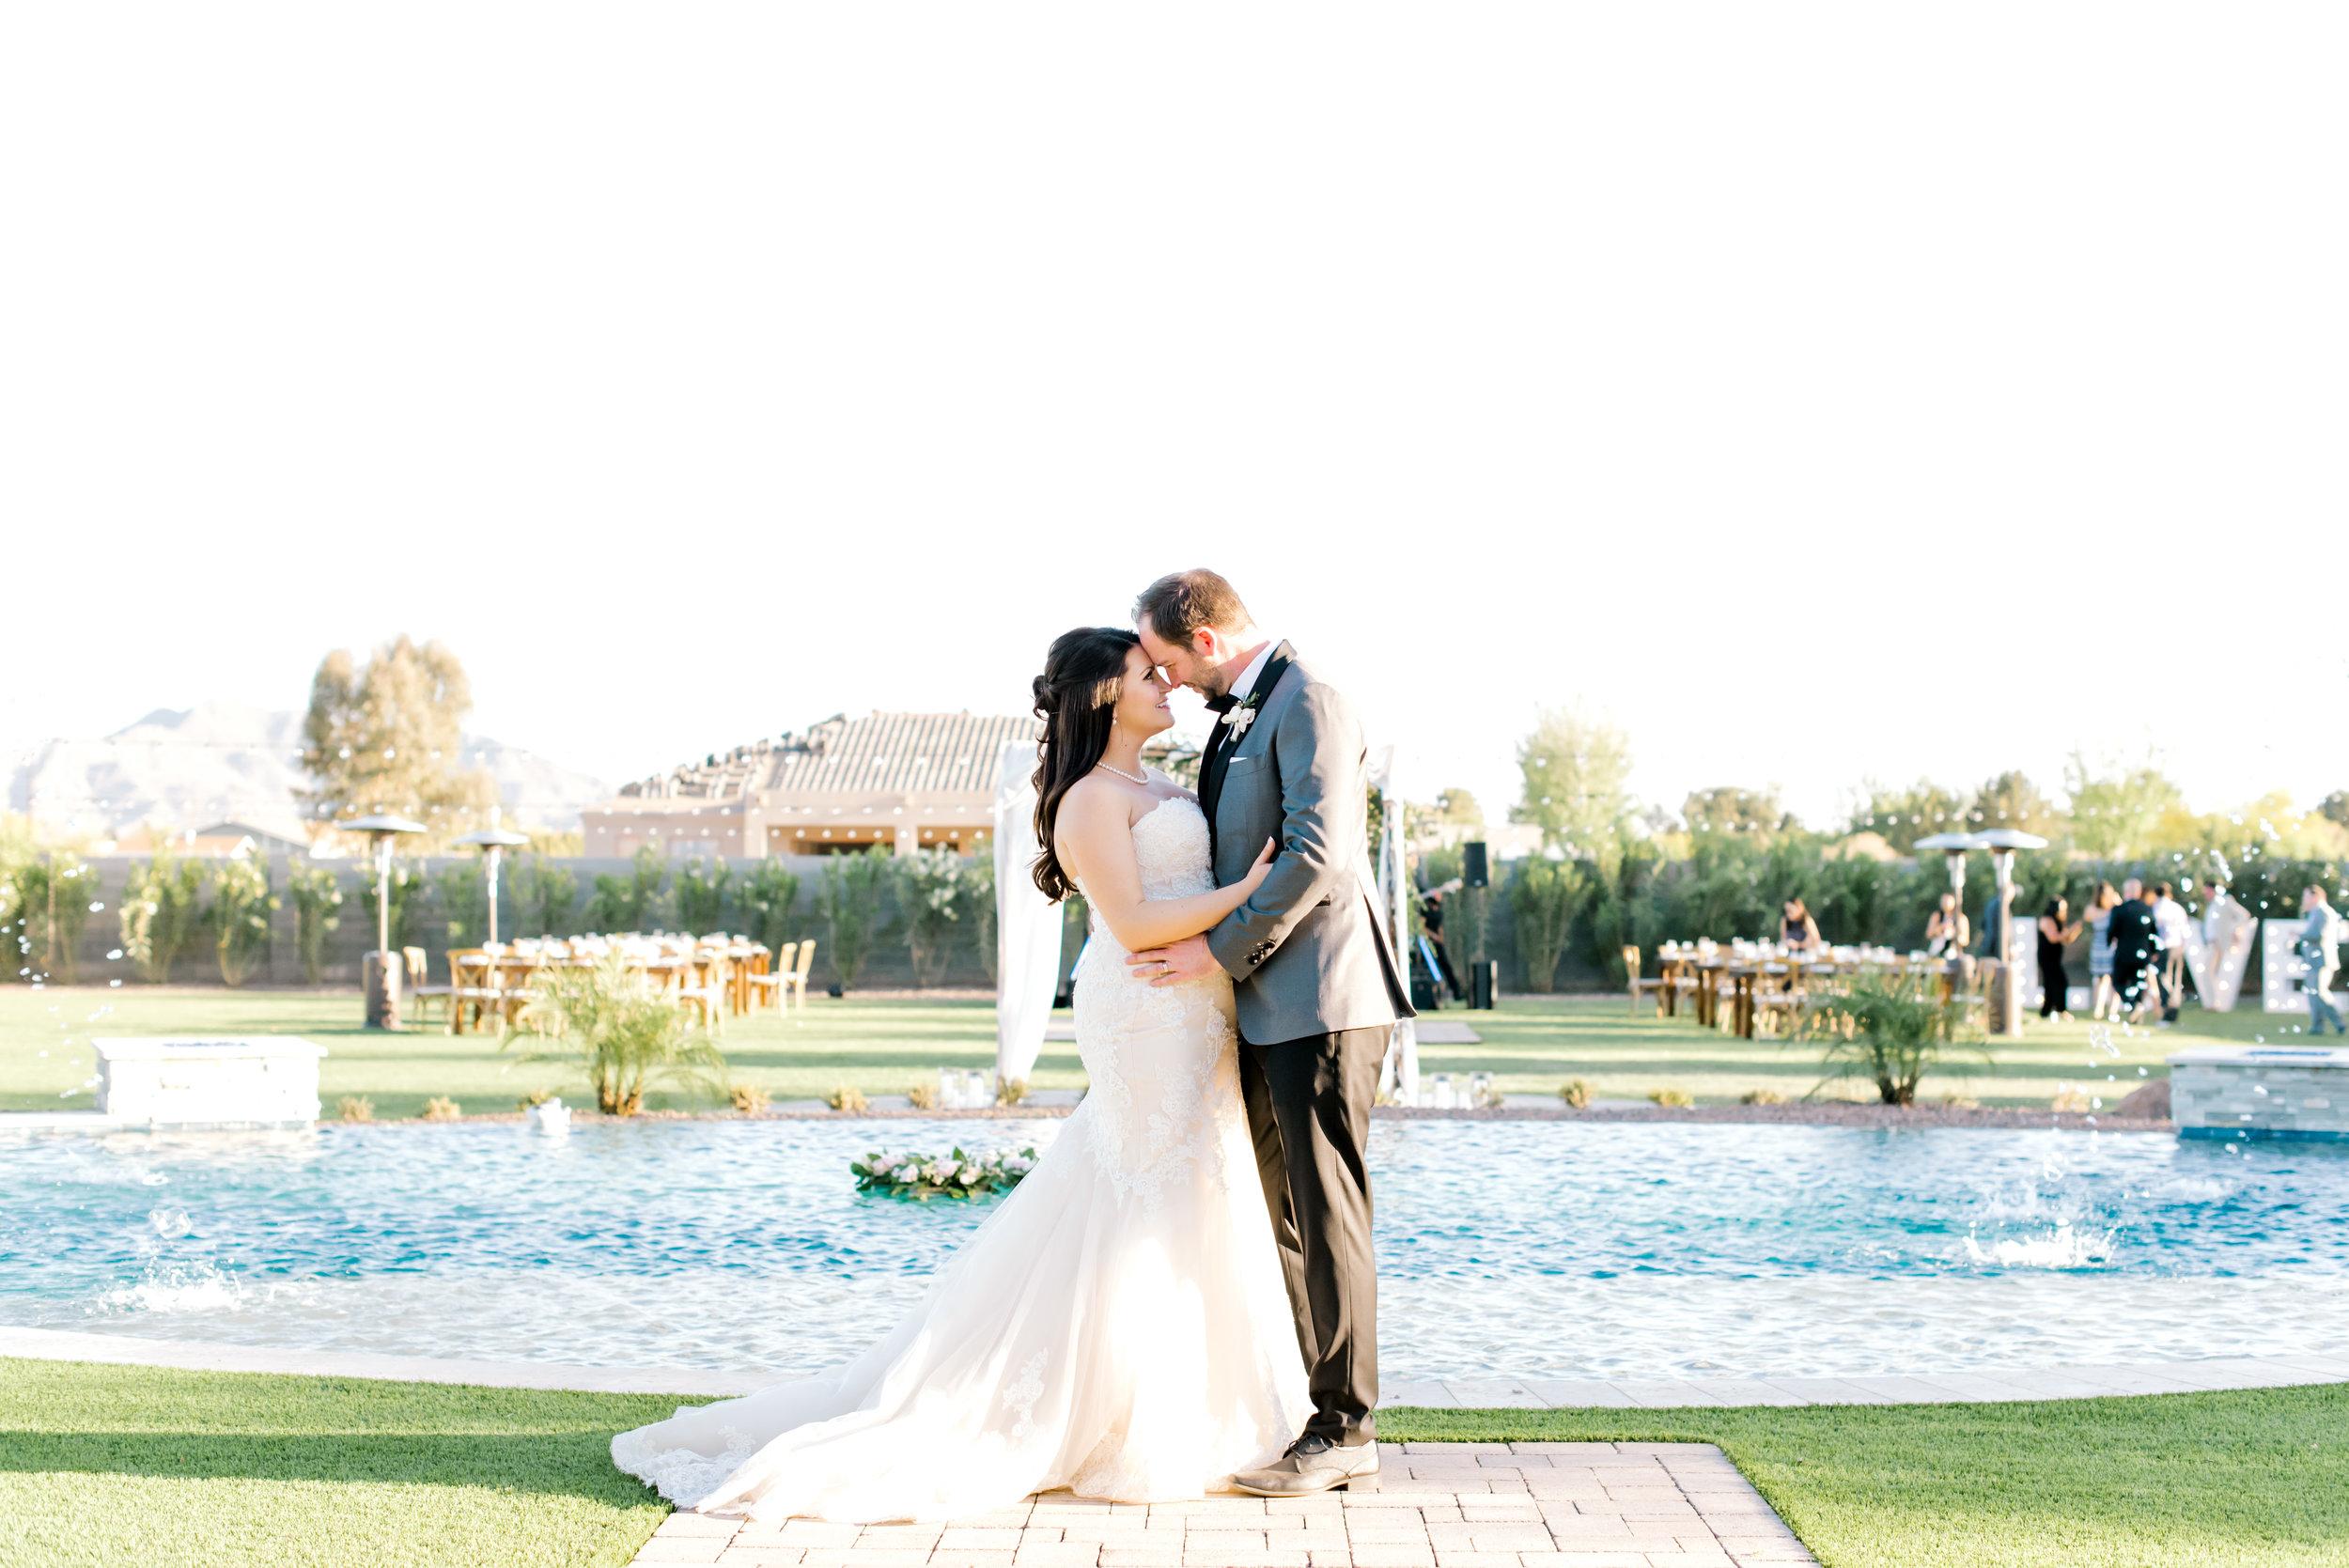 Blush and white backyard wedding